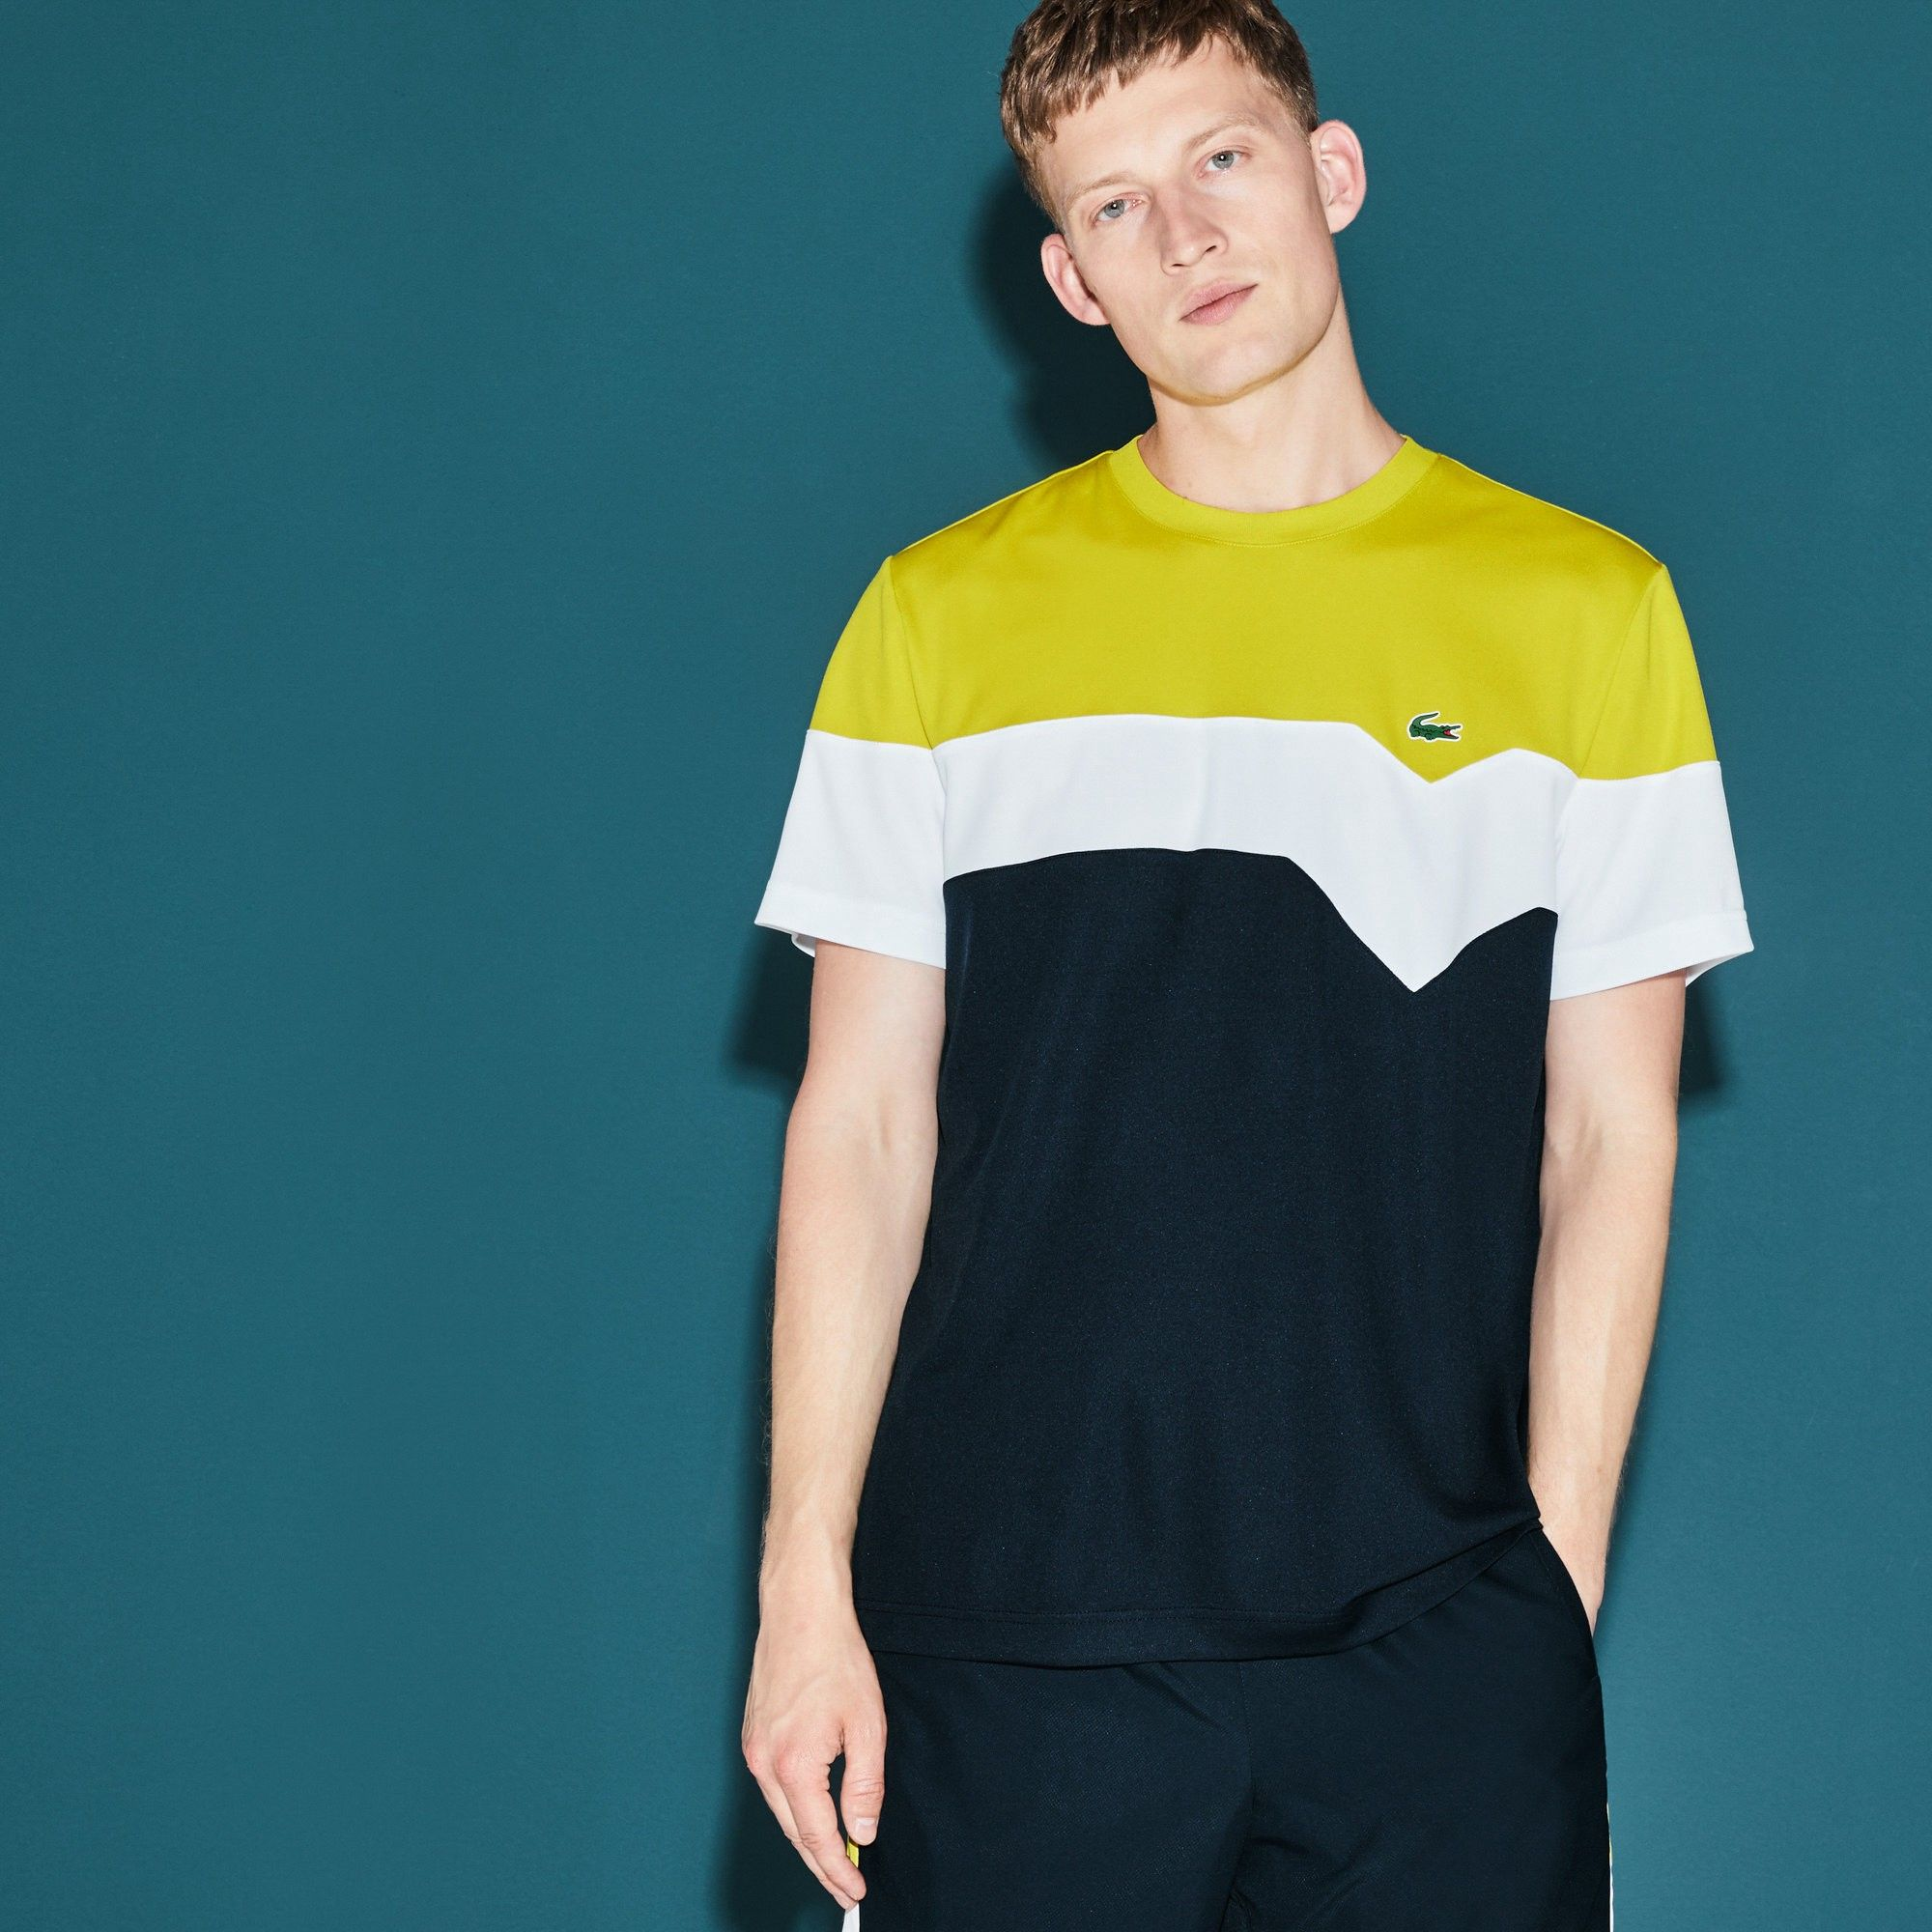 81928991 LACOSTE Men's SPORT Tennis Colorblock Technical Piqué T-shirt - soda yellow/ white-navy bl. #lacoste #cloth #